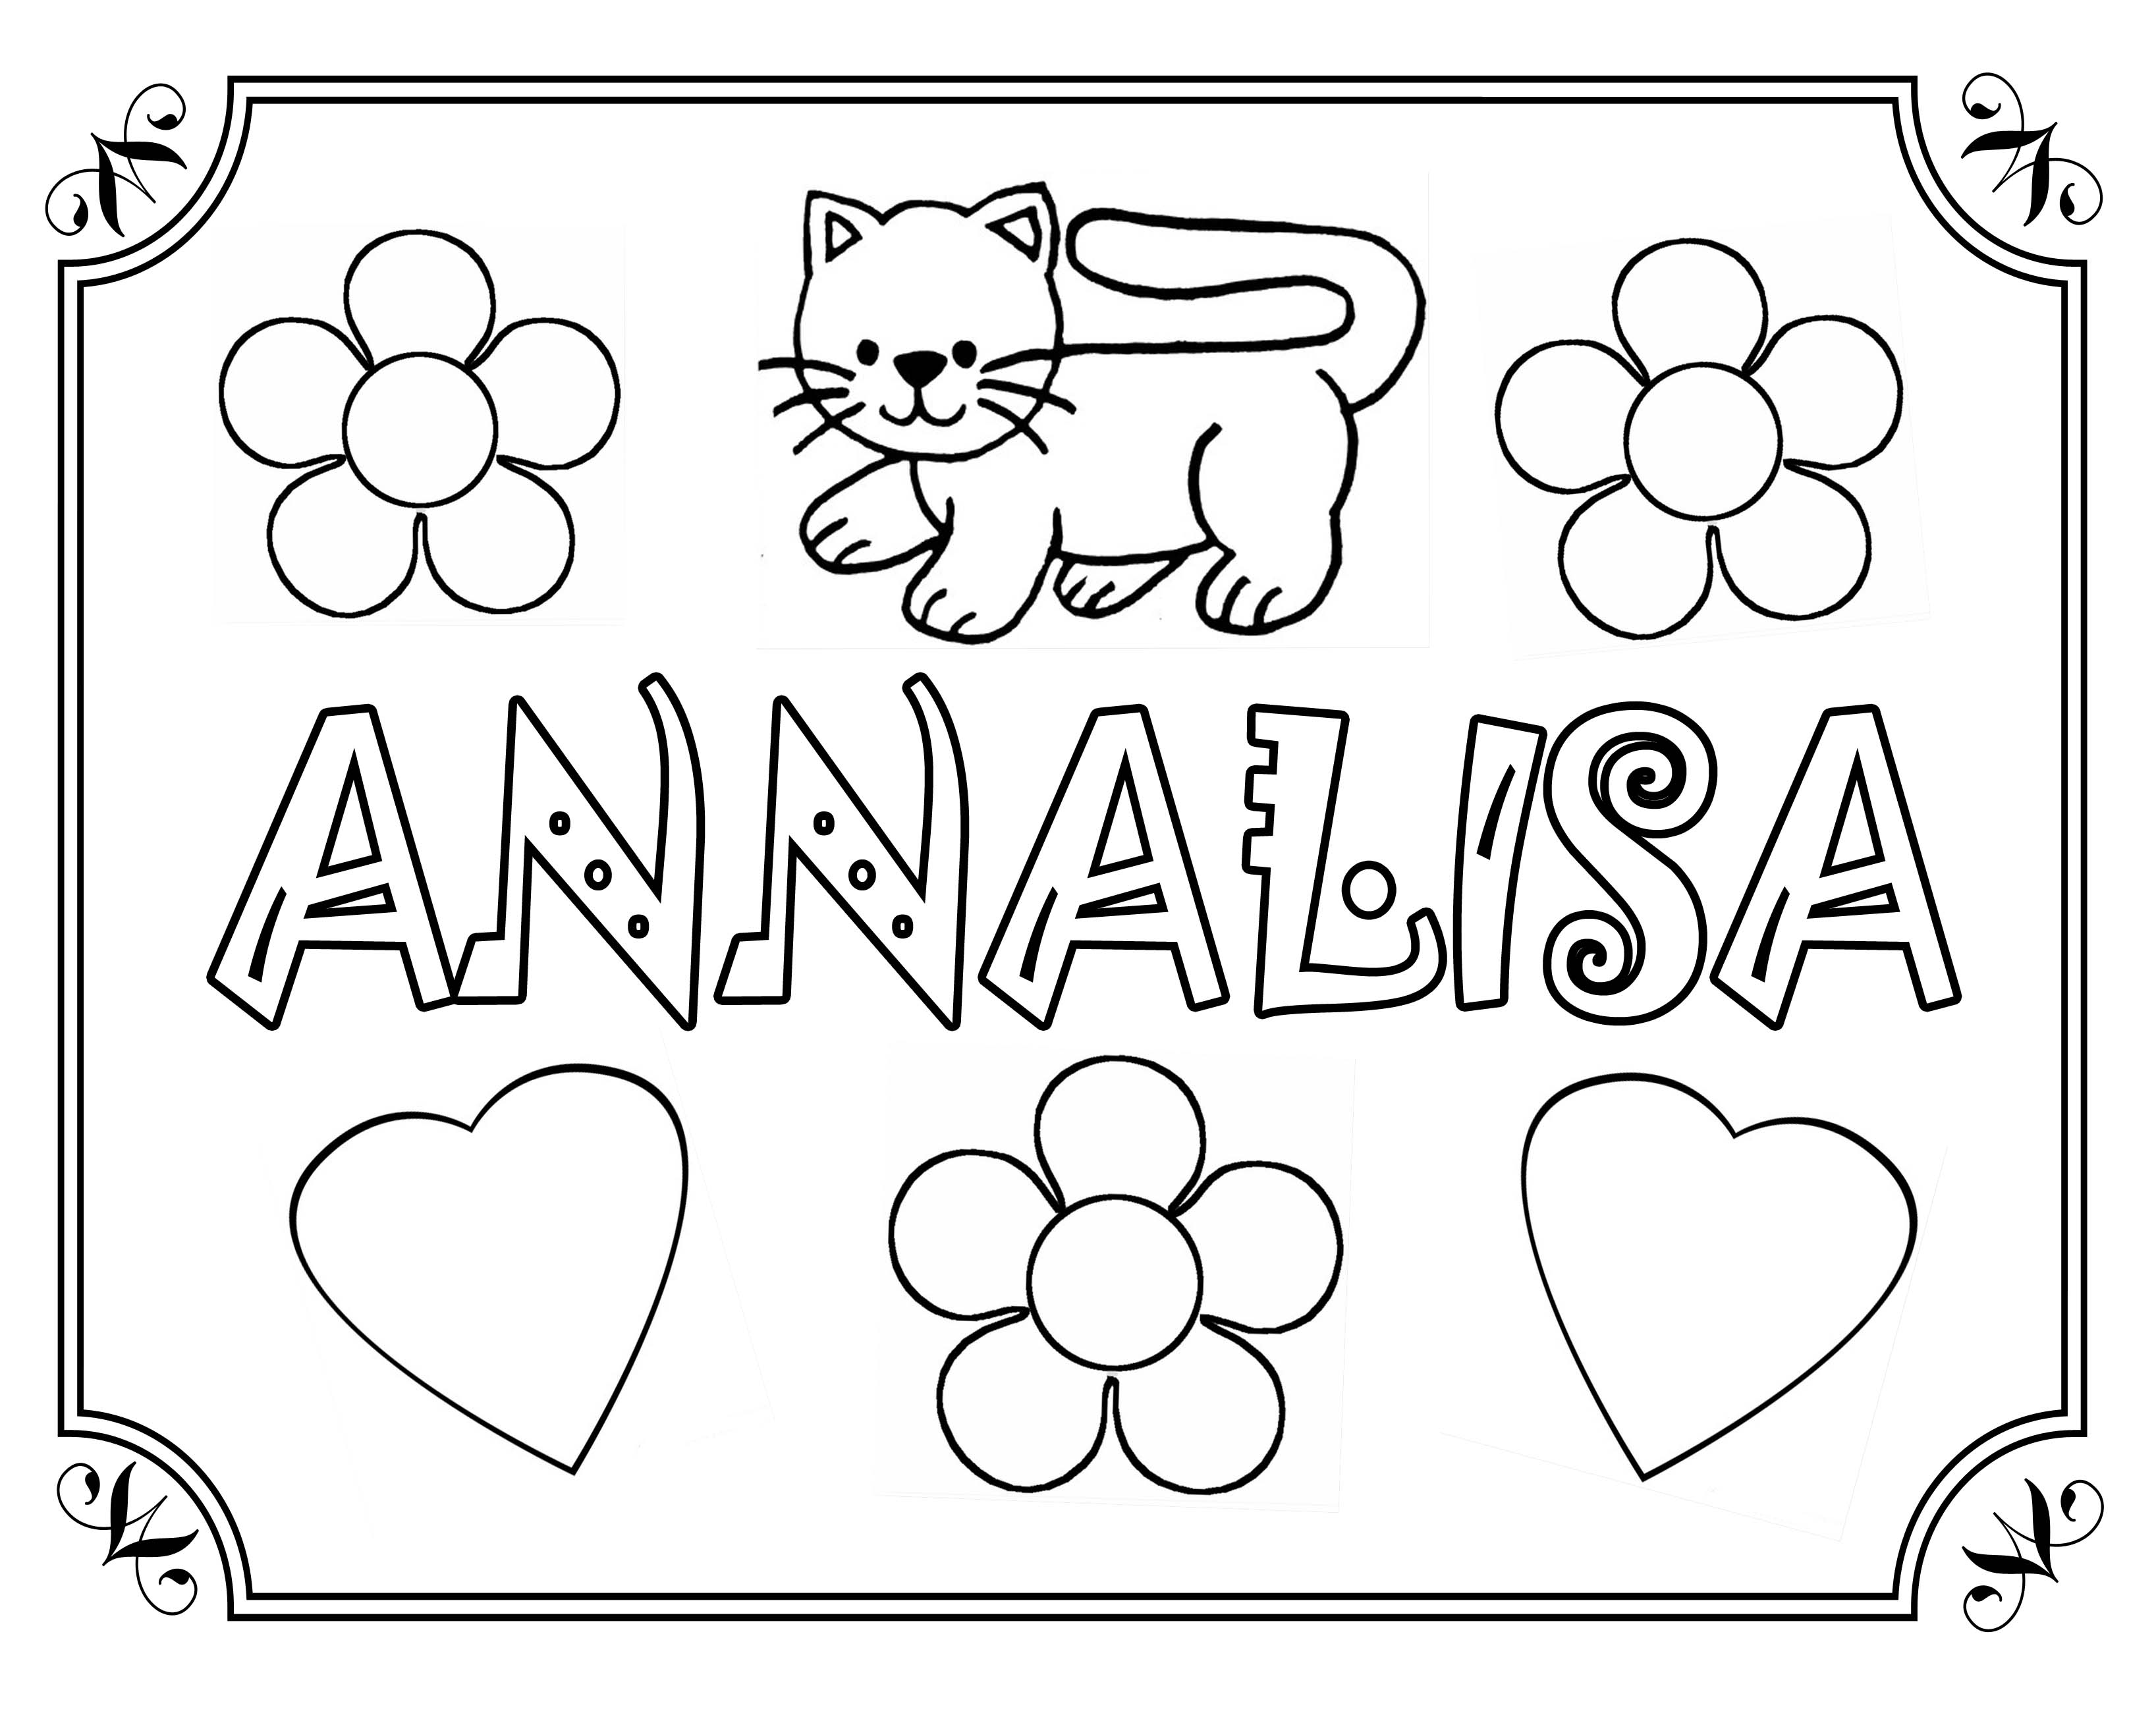 20 dessins de coloriage pr nom avec dessin gratuit imprimer - Prenom a imprimer ...